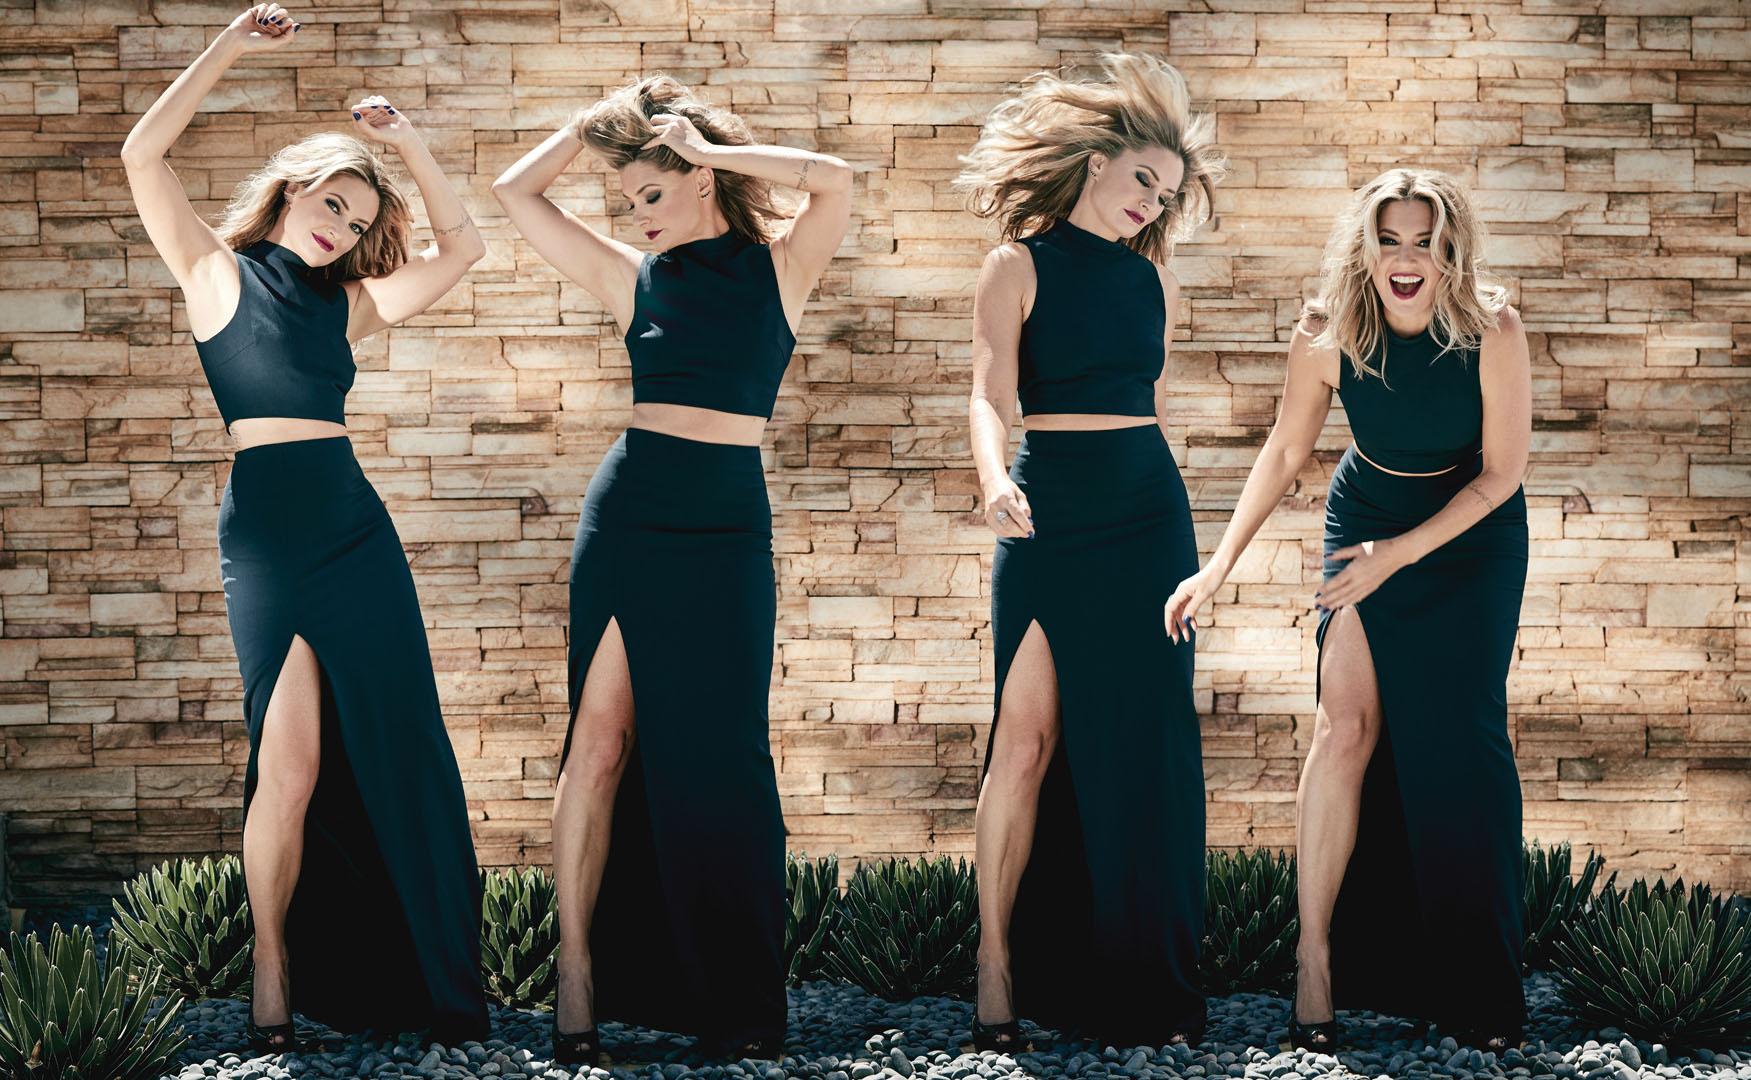 No surprise here: Mädchen Amick looks amazing!